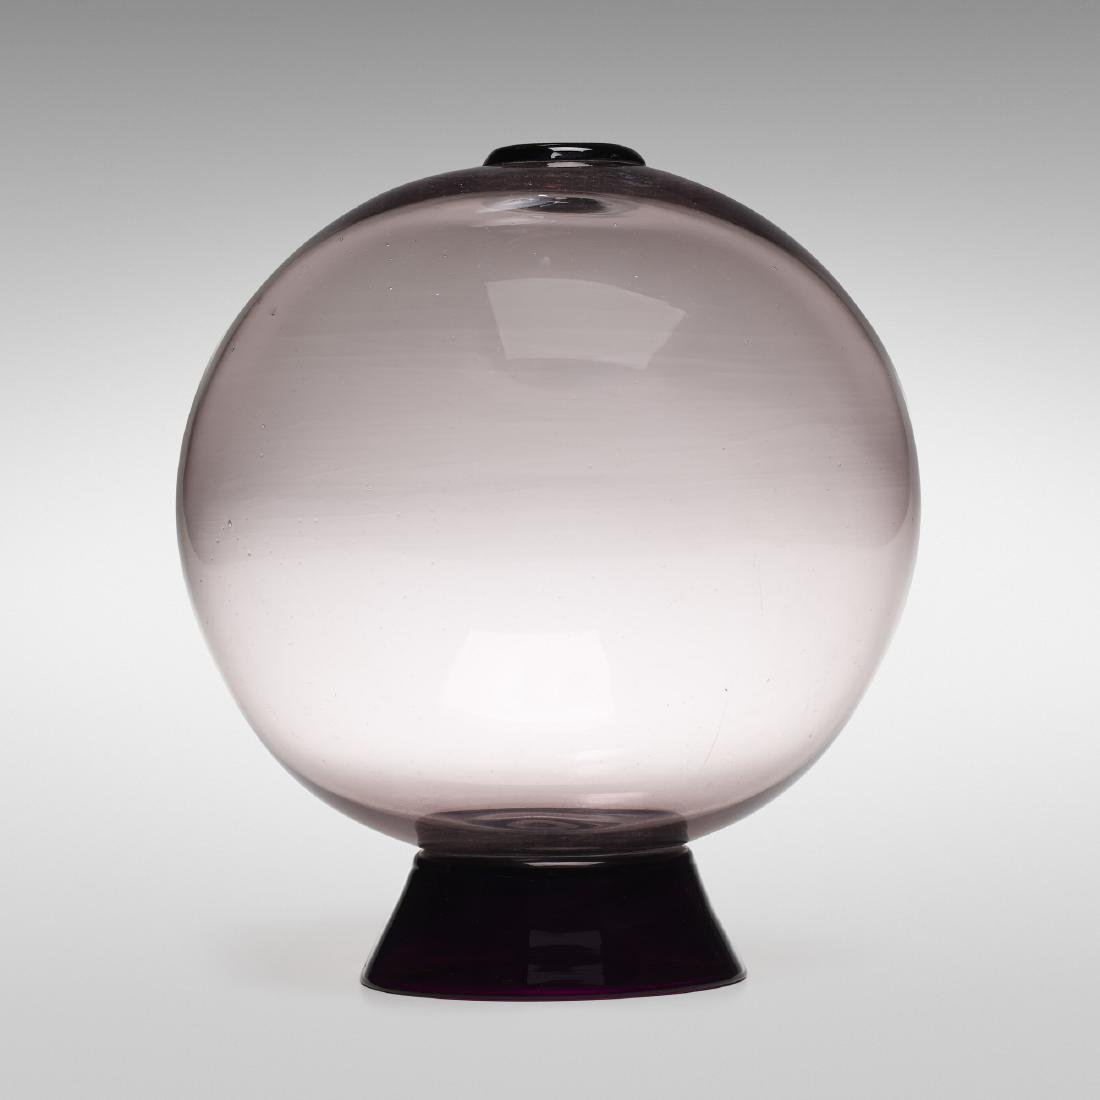 Carlo Scarpa, Transparenti vase, model 5673